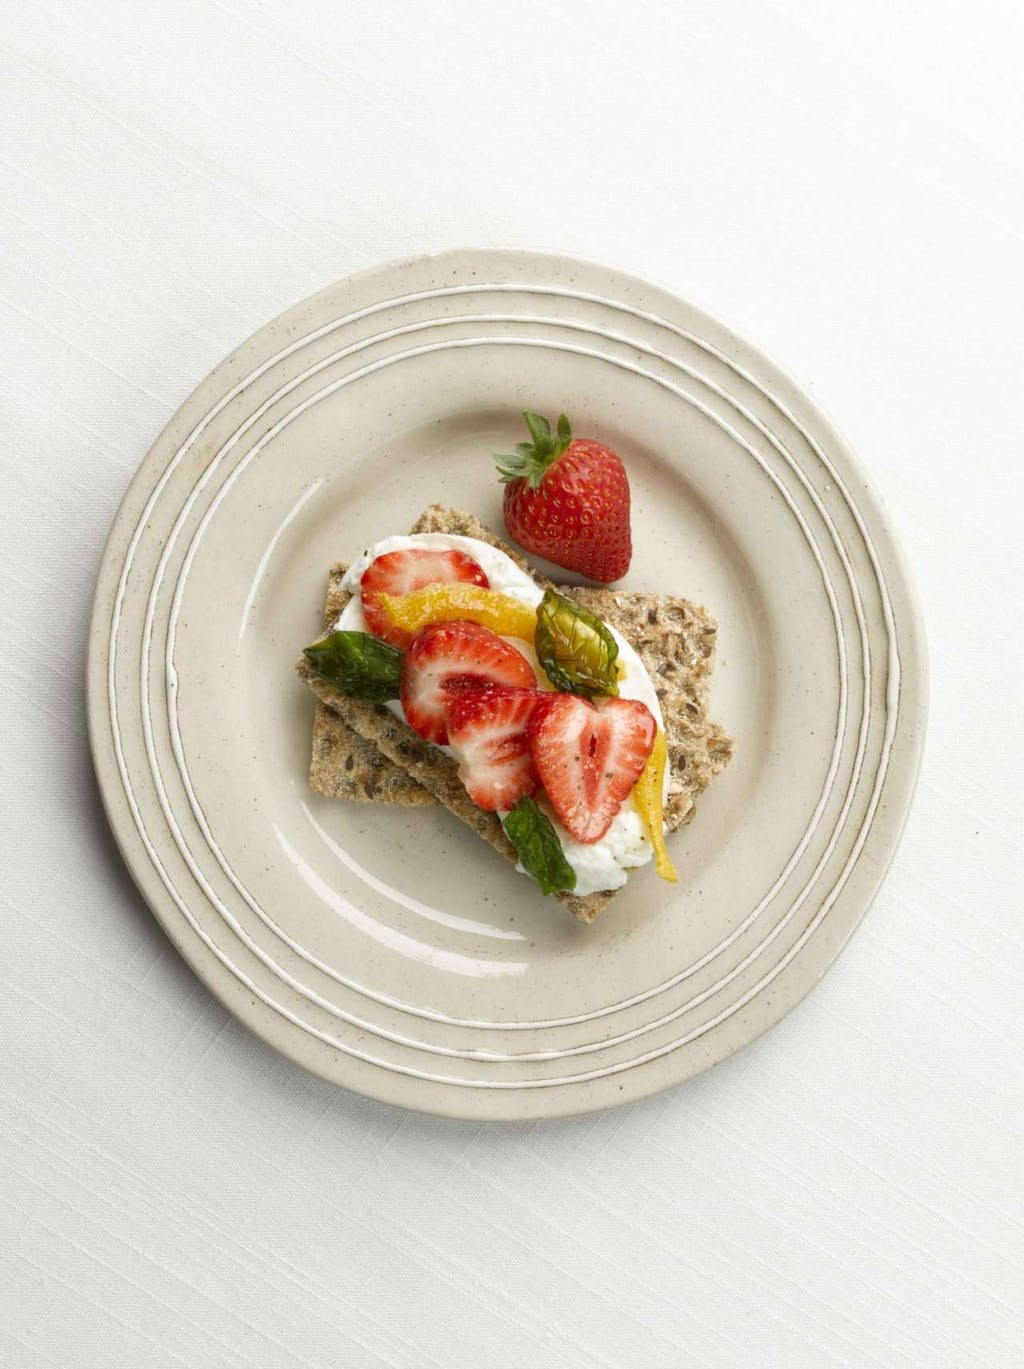 Berry World Strawberry Lemon and Basil Salad with Buffalo Mozzarella Riveta 75inppmid